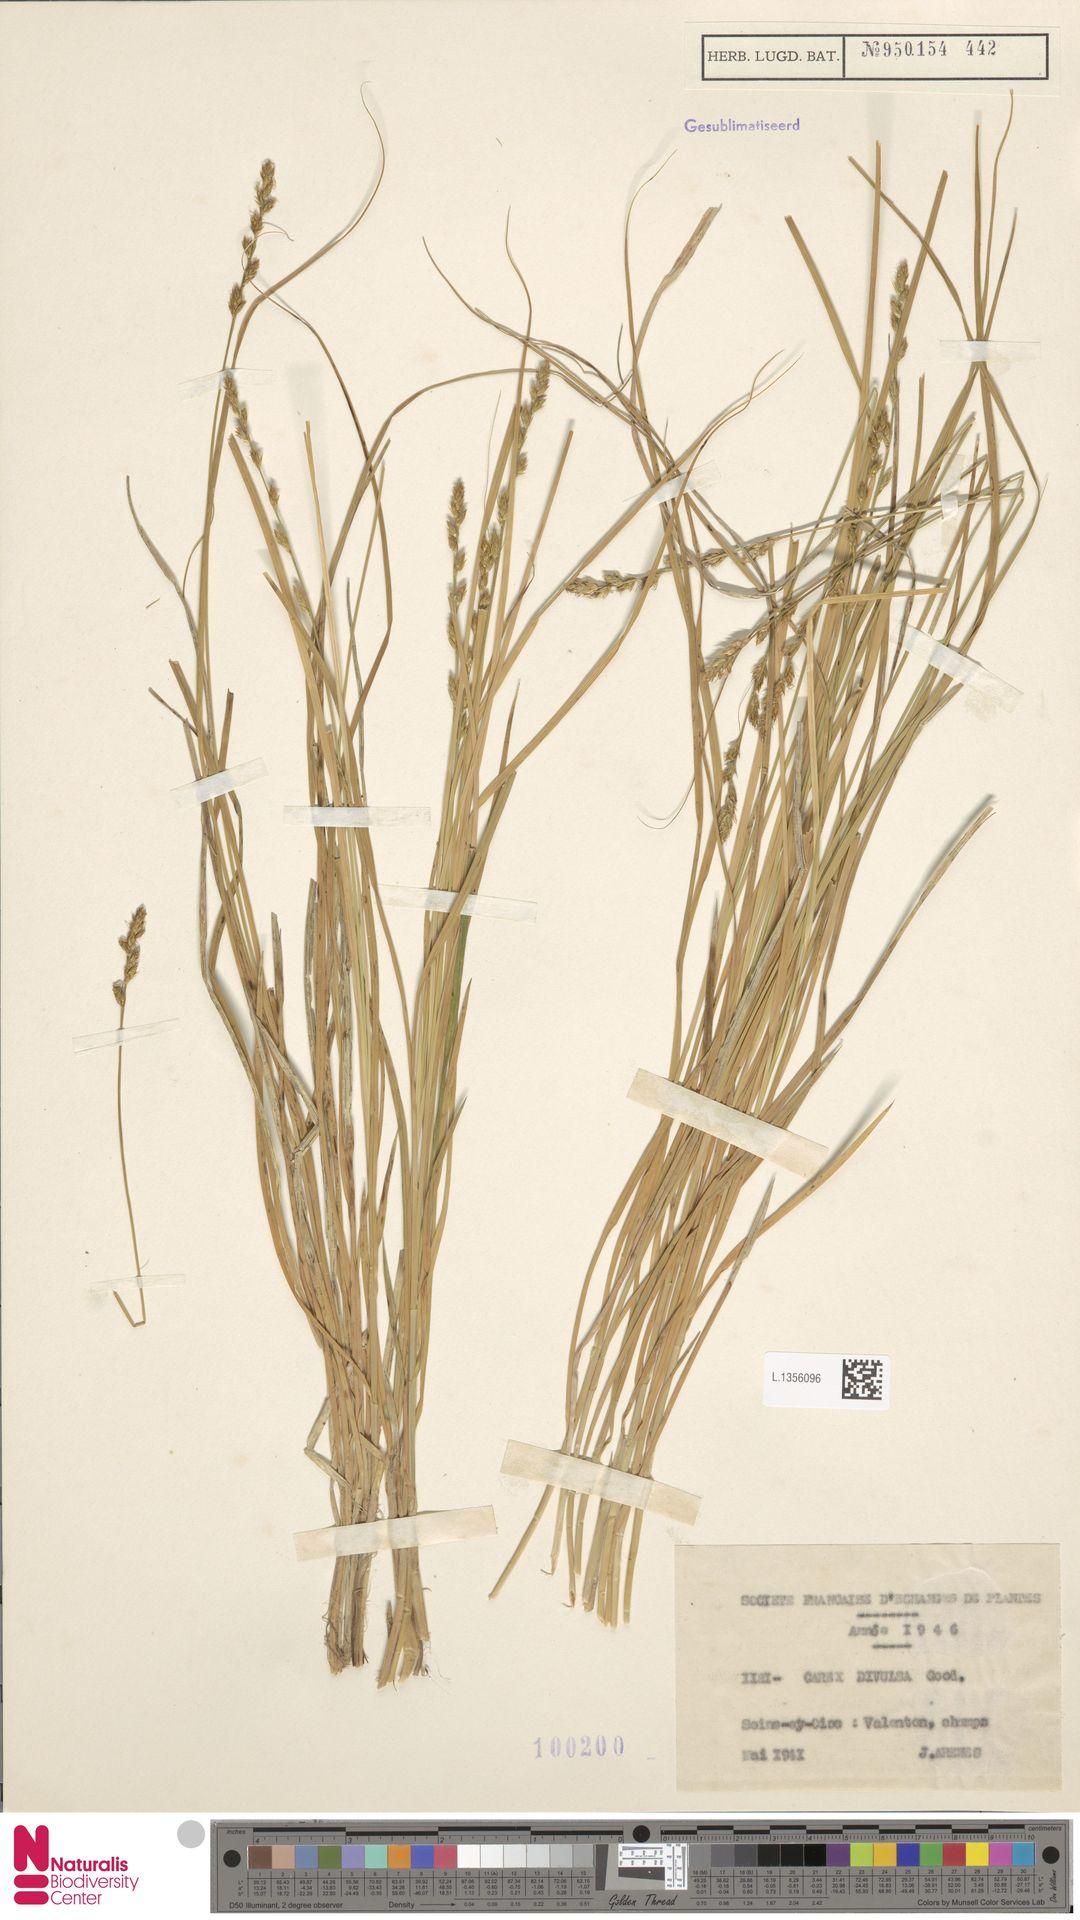 L.1356096 | Carex divulsa Stokes